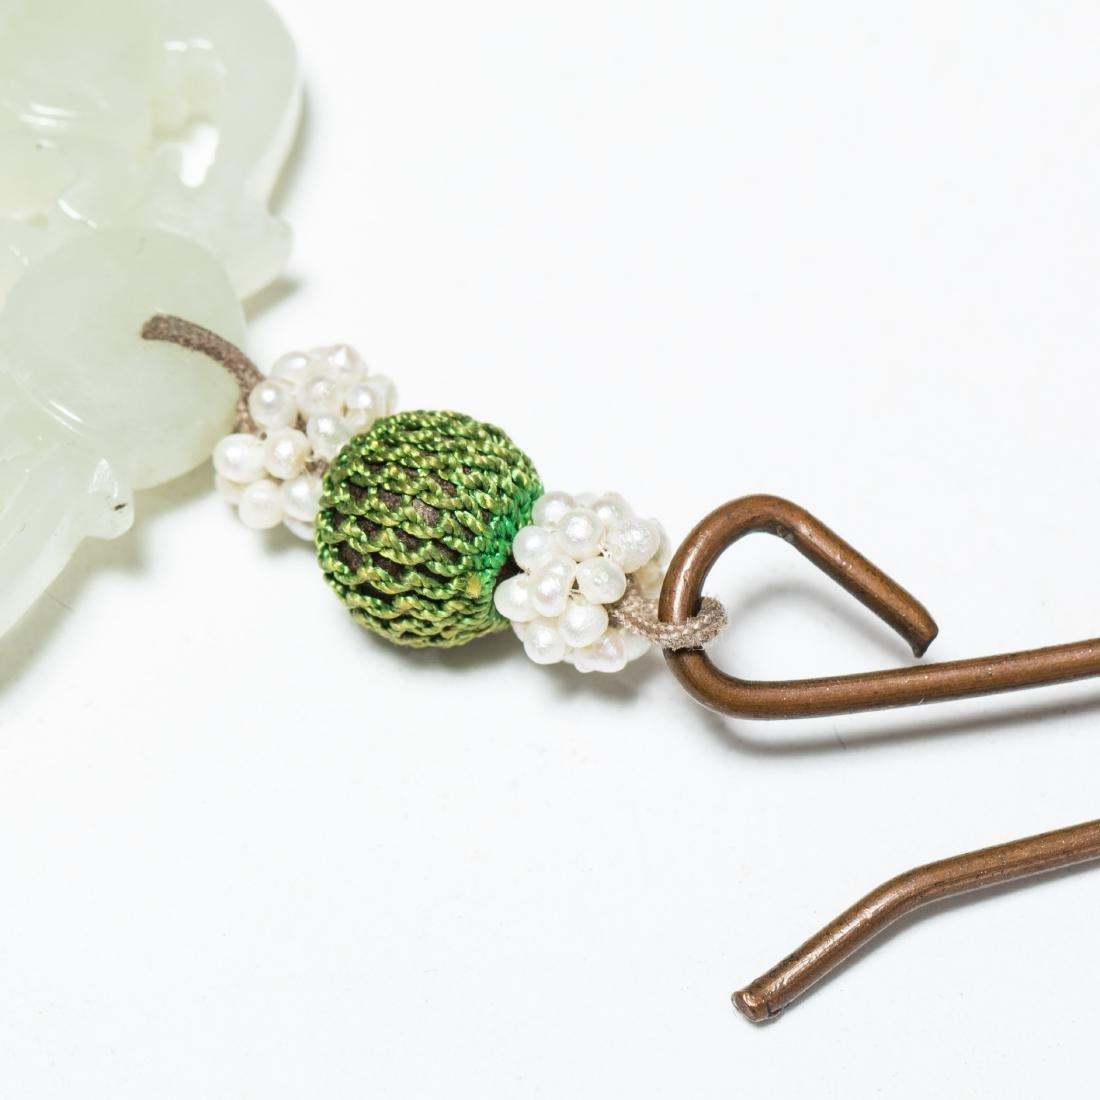 19th Manchu Style Antique Jade Pendant - 10